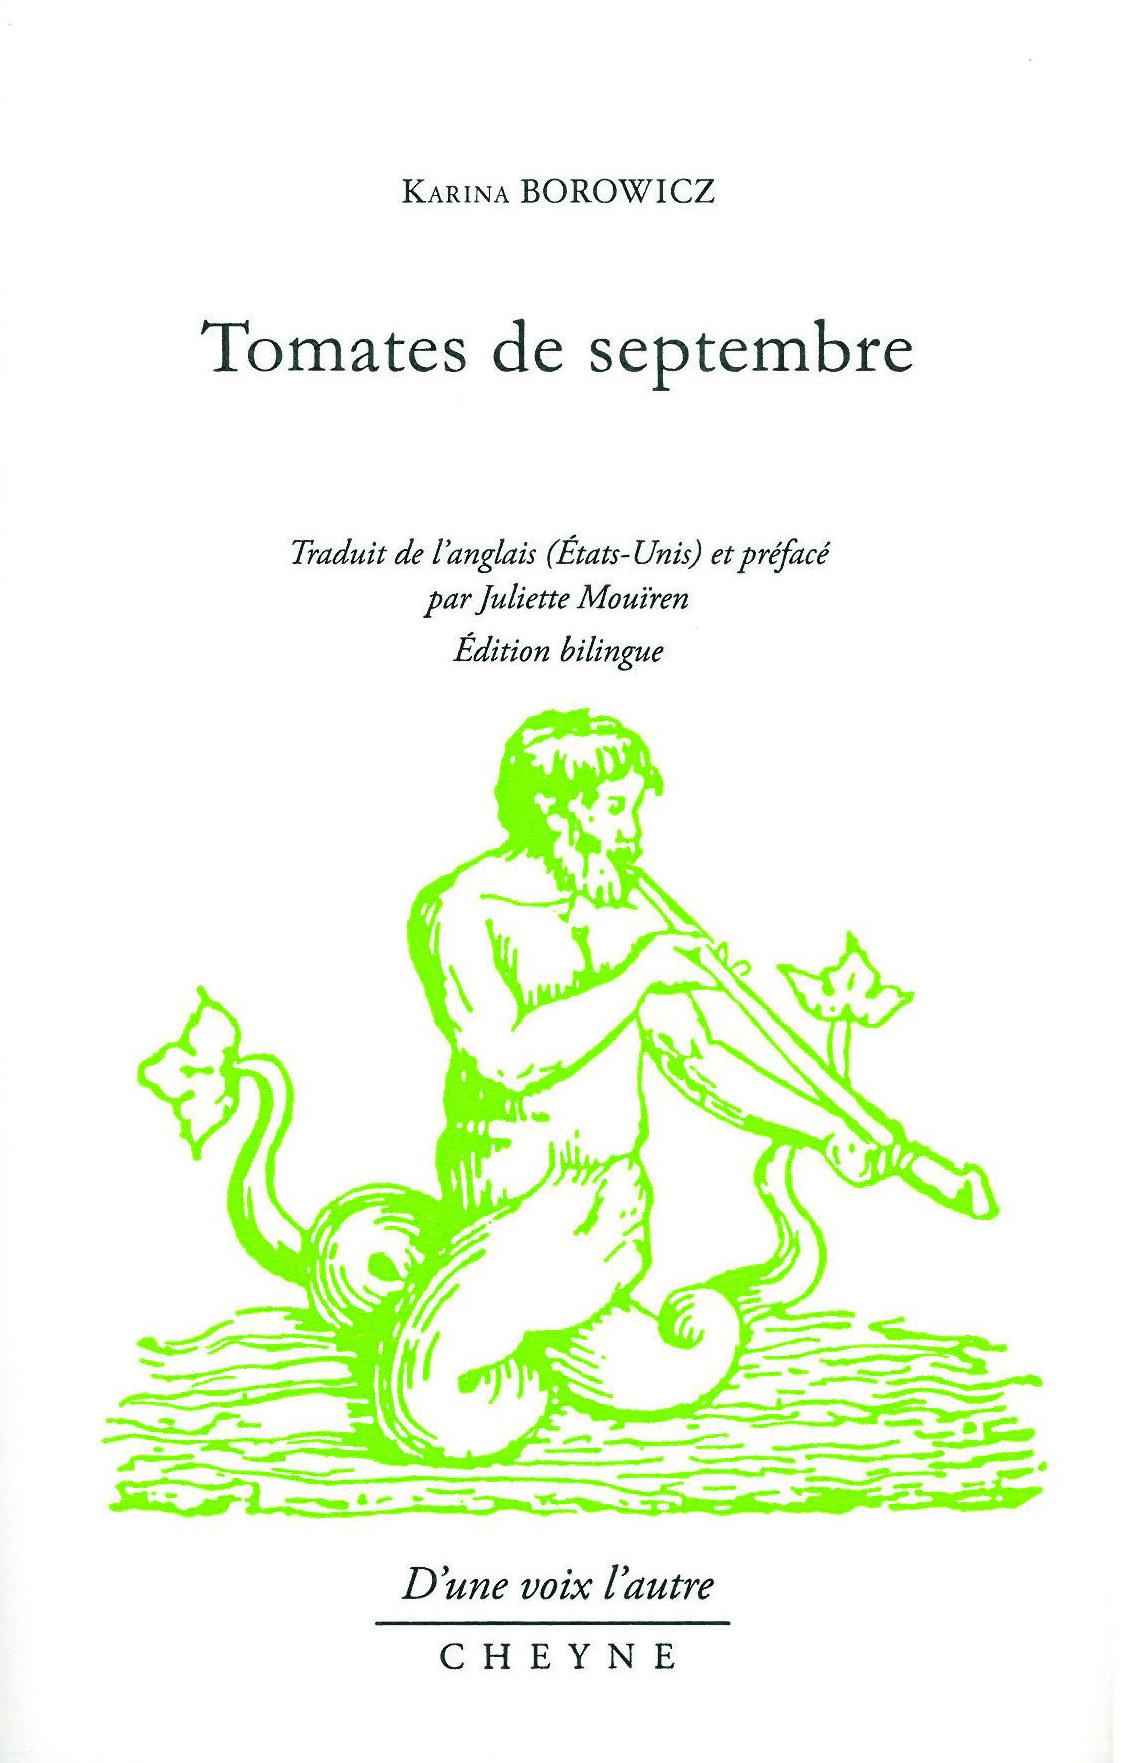 Tomates de septembre cover